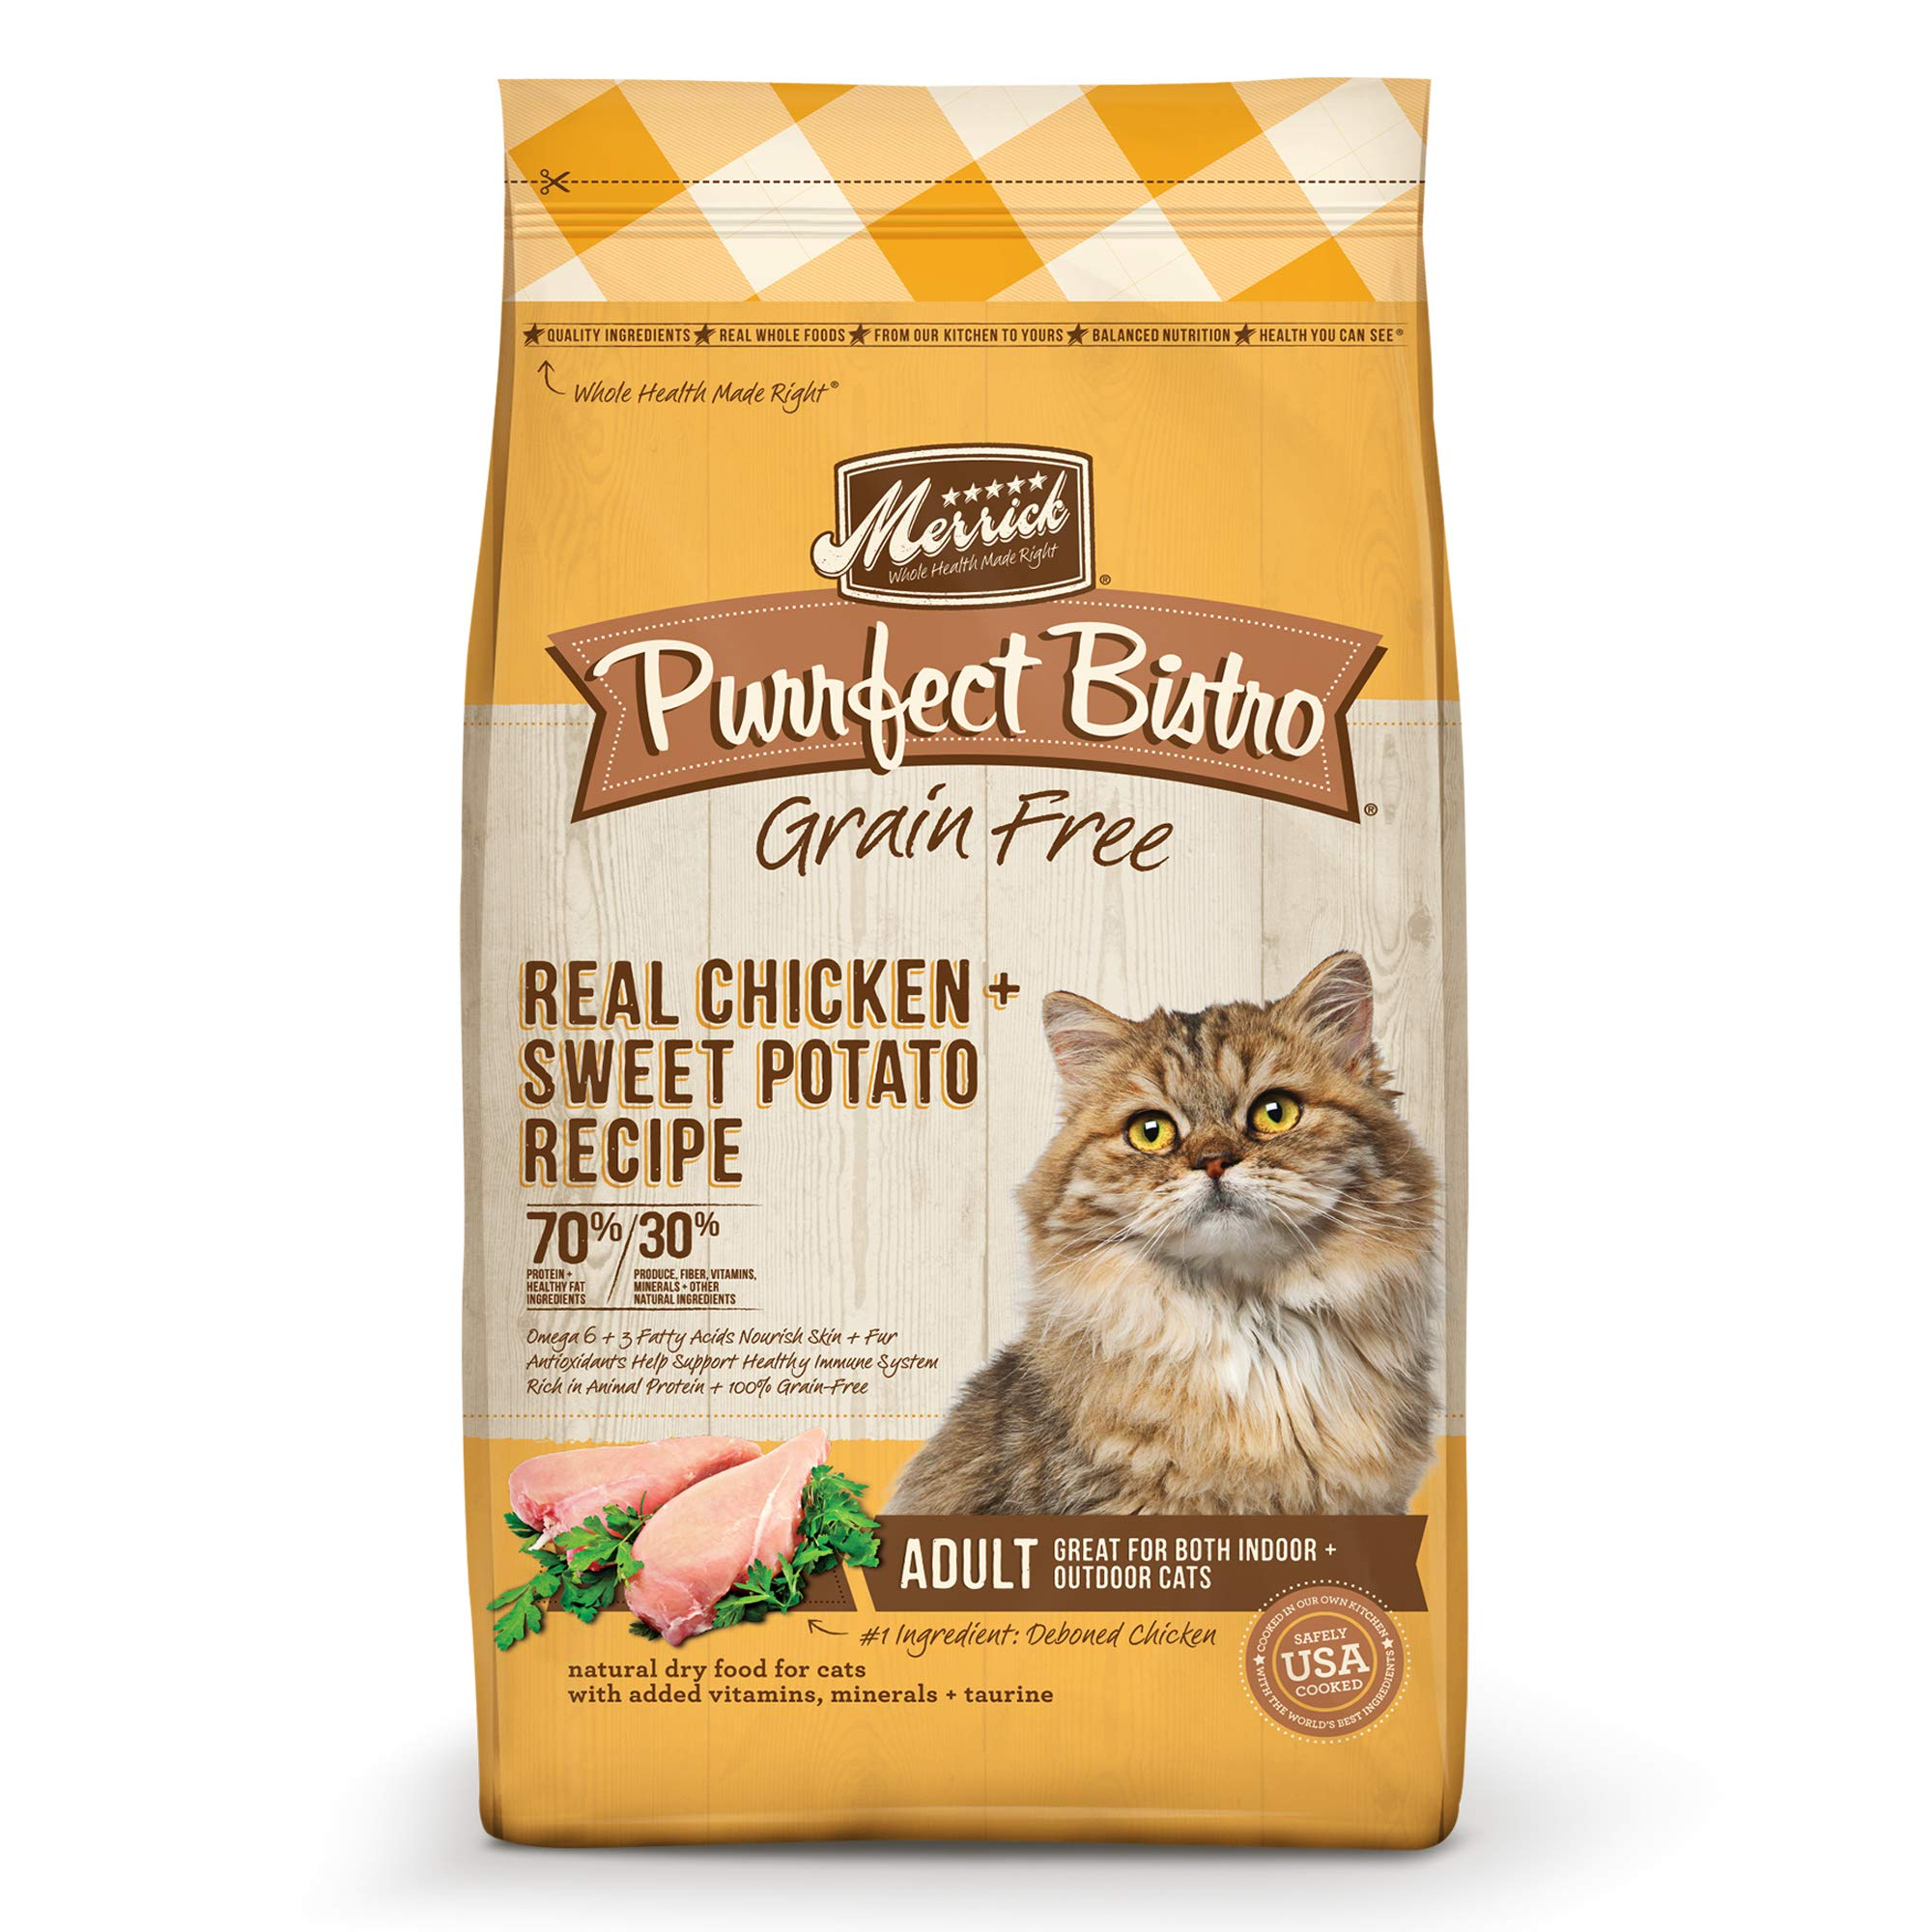 Merrick Purrfect Bistro Grain Free Real Chicken Adult Dry Cat Food, 12 Lbs. by Merrick